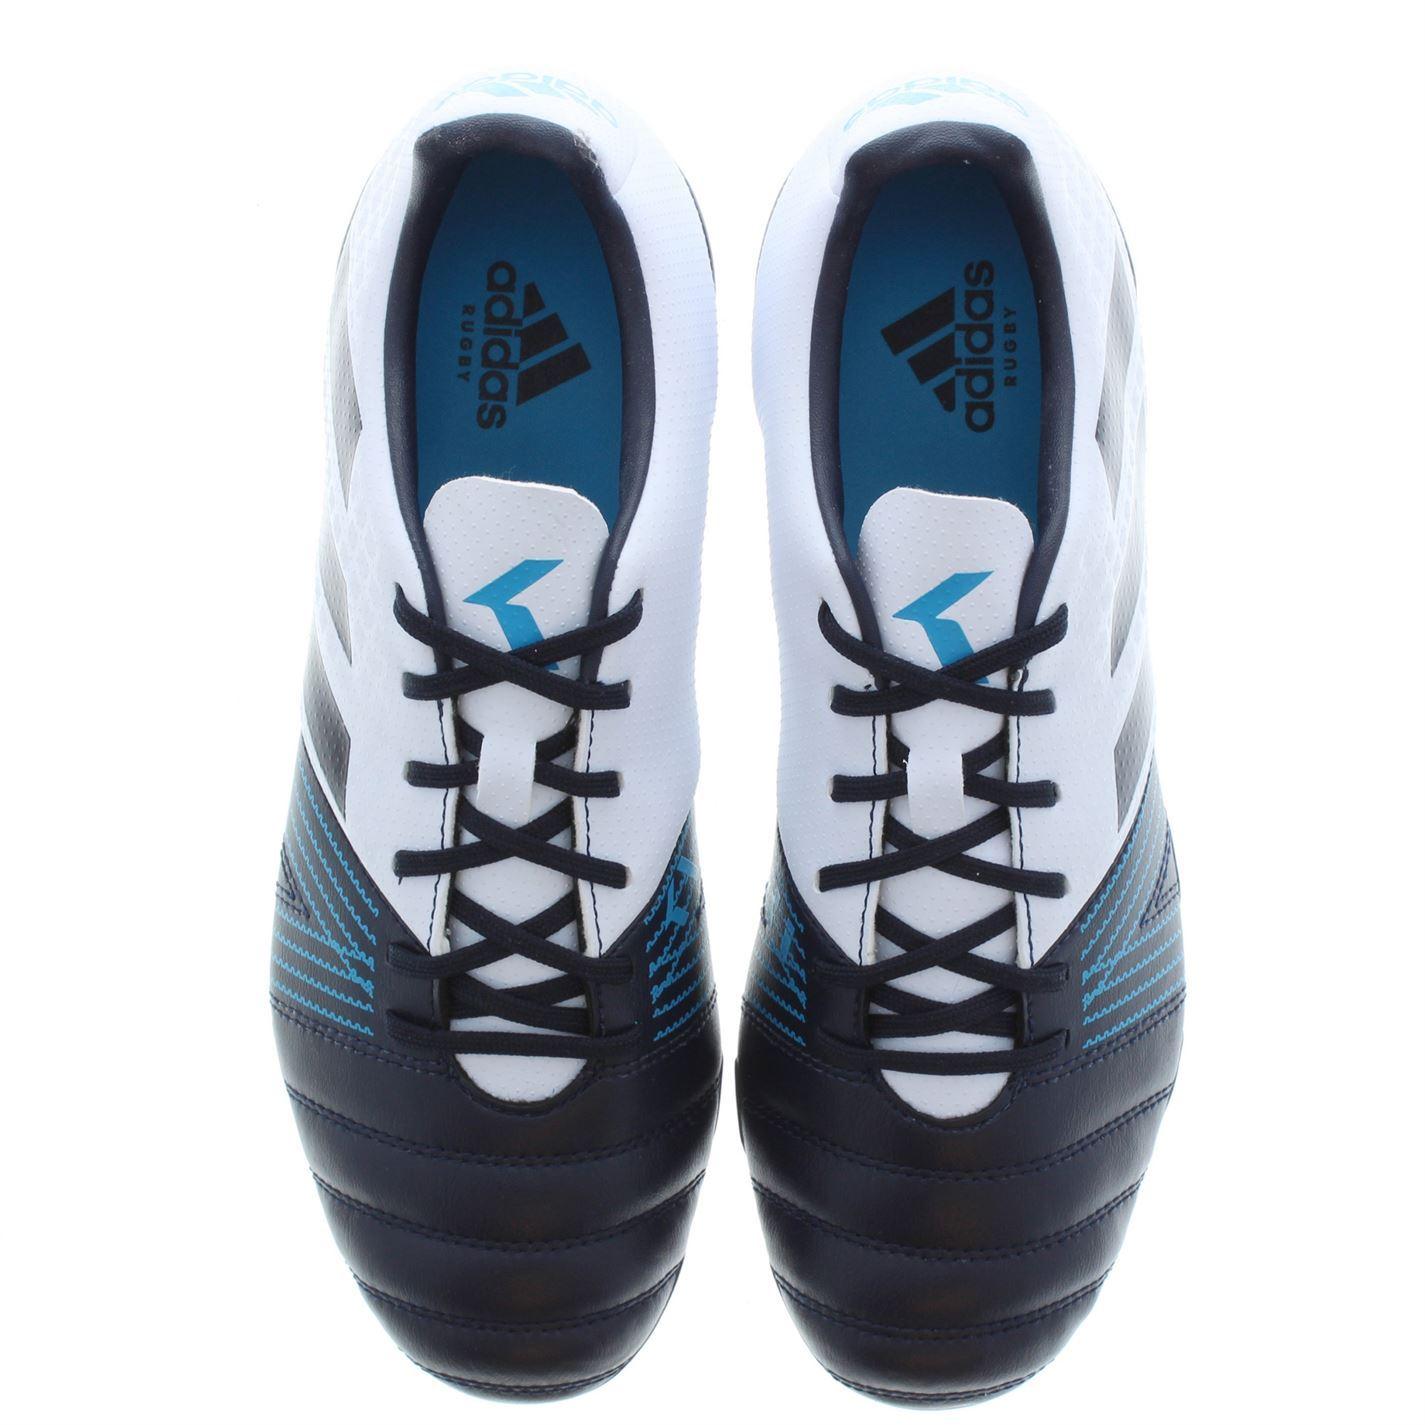 66cee973 adidas Kakari SG Mens Rugby Union Boots Blue Trainers Footwear   eBay